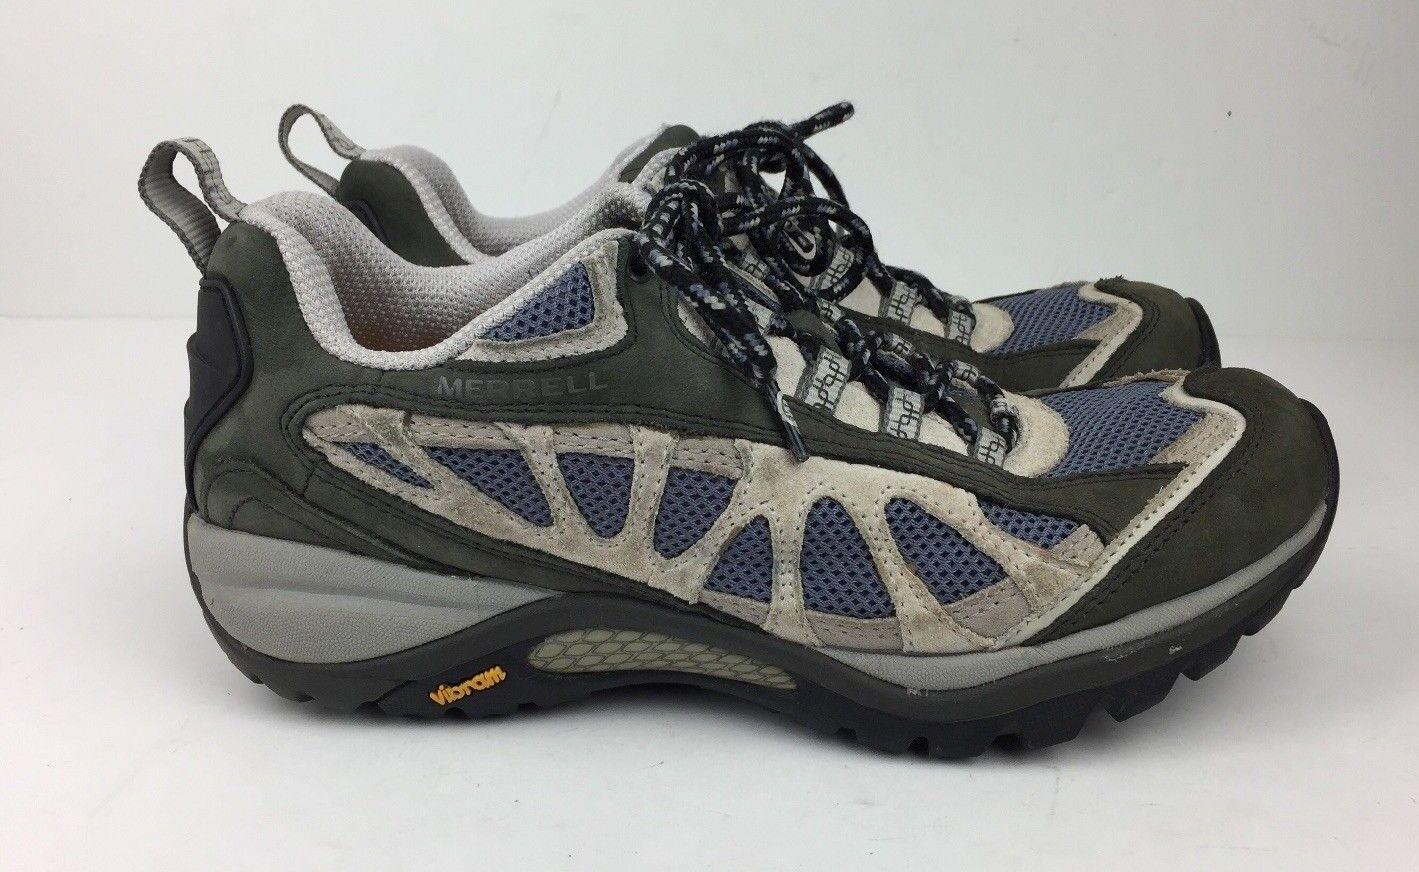 Merrell Siren Ventilator Shoes Women's Hiking  Athletic Trail Multi-Color Sz 7 M